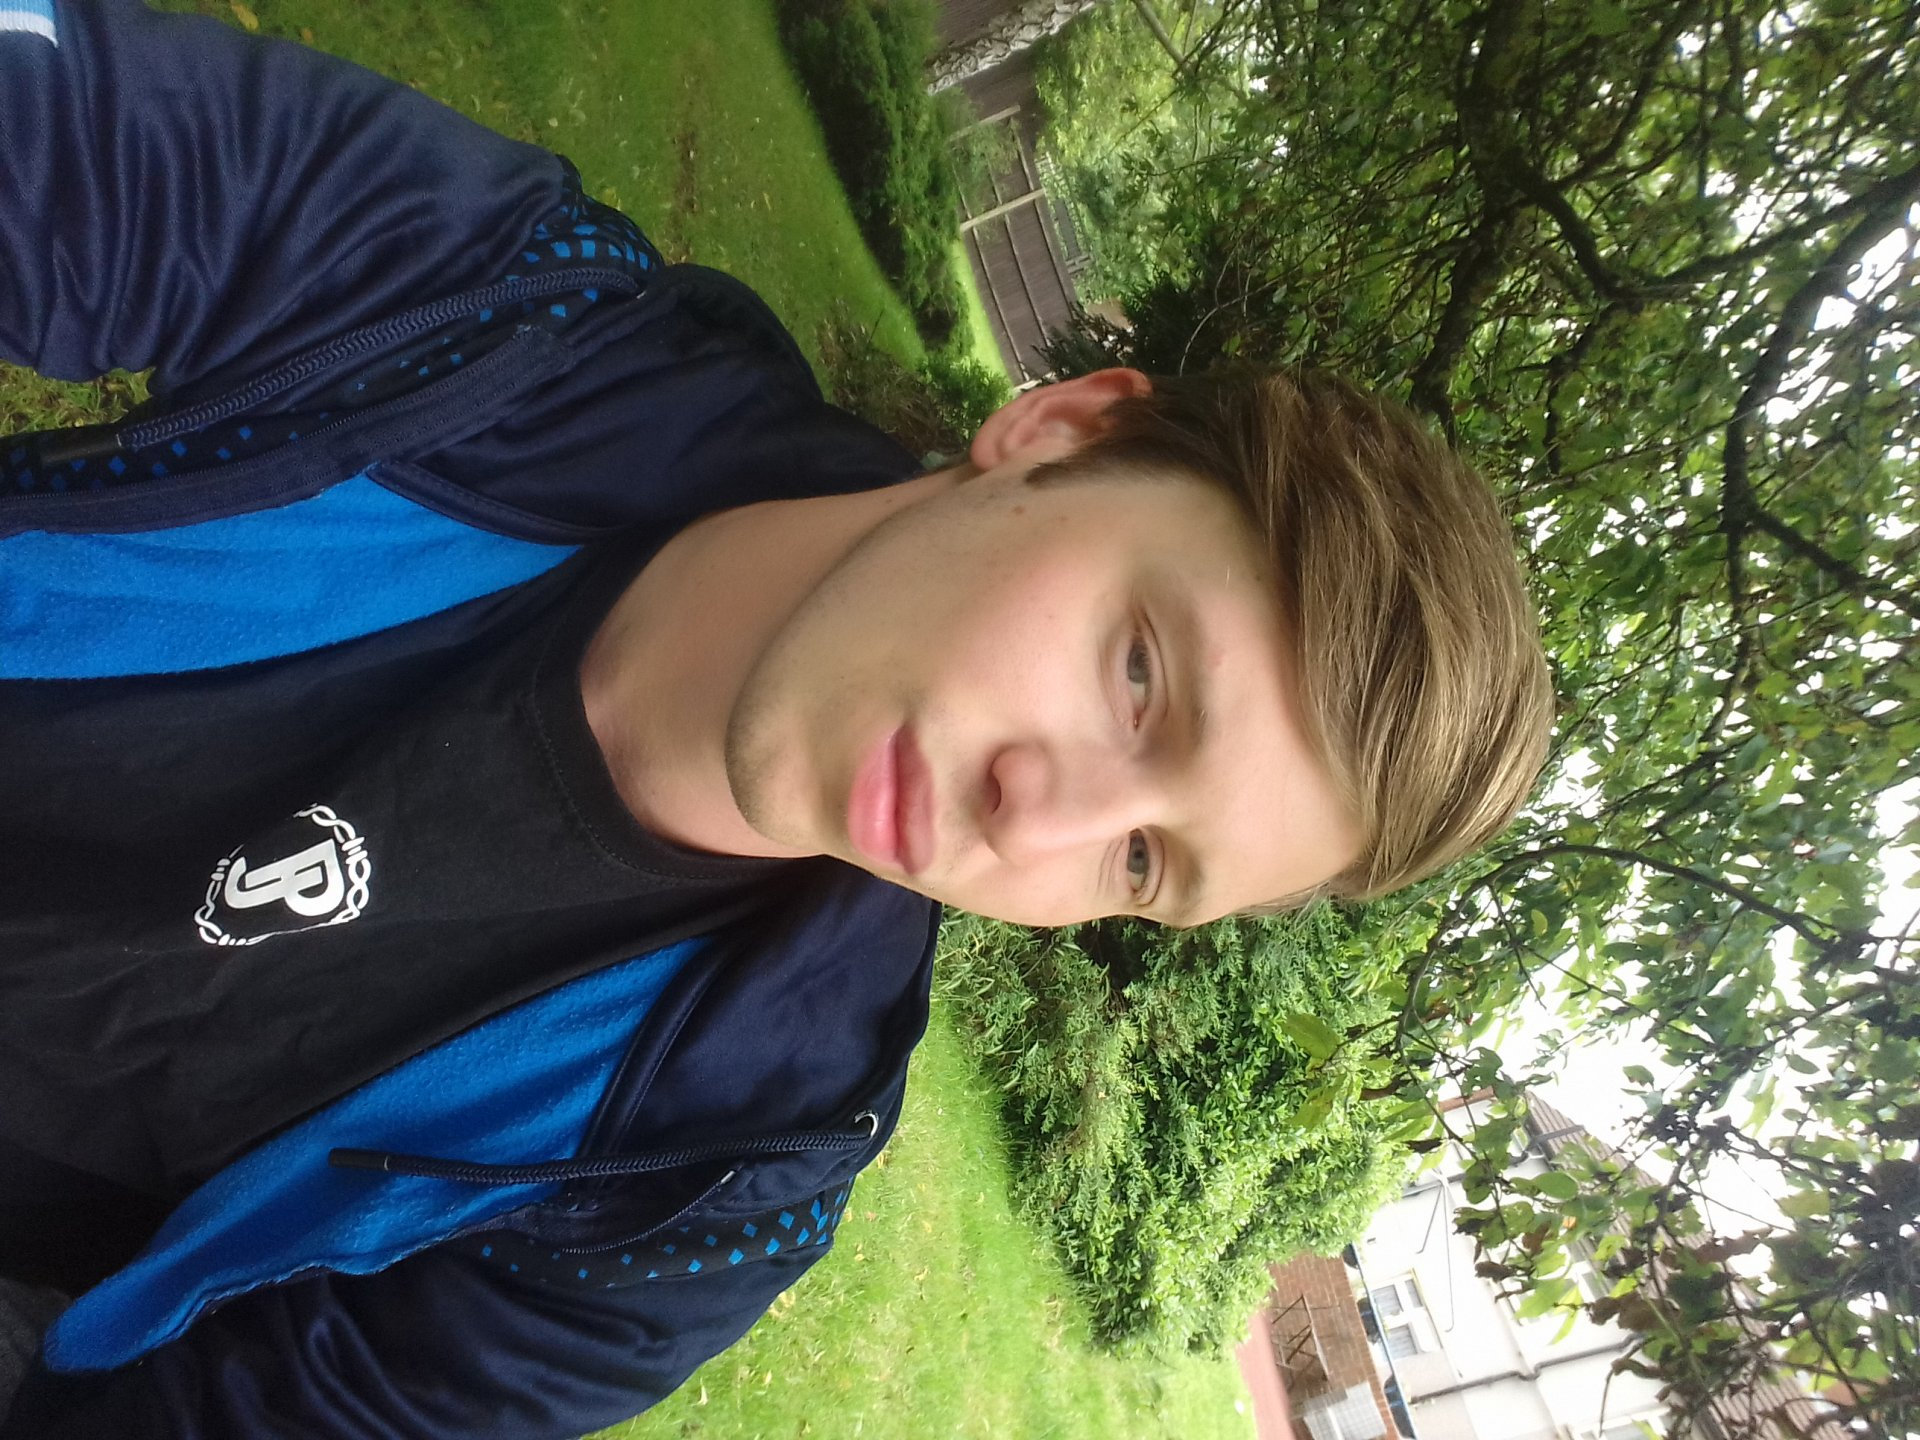 JYM.REAPER from Hertfordshire,United Kingdom